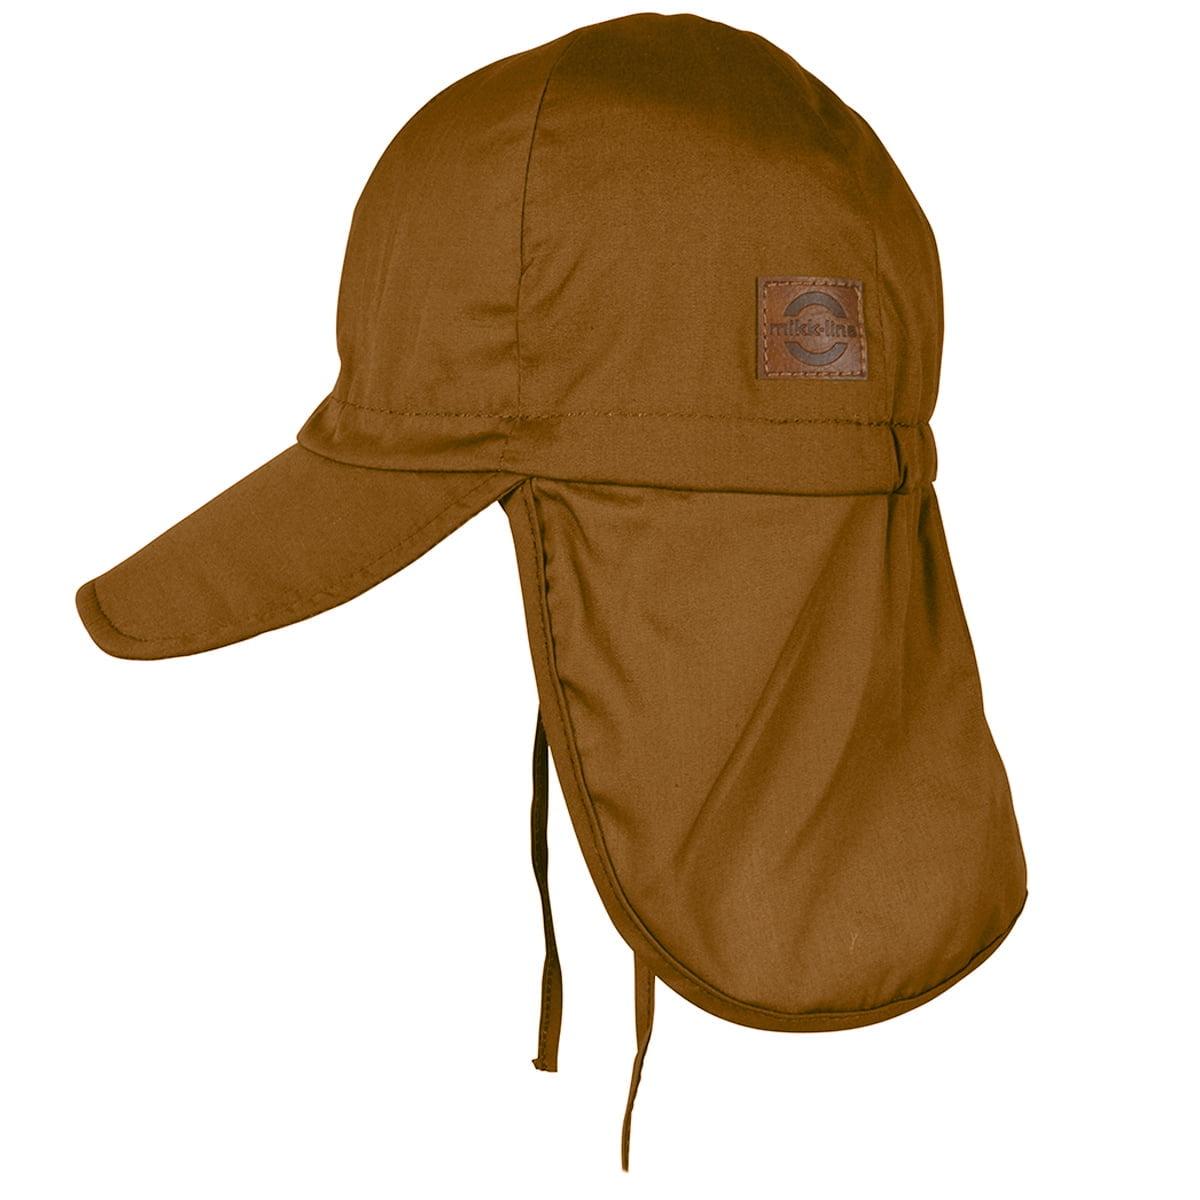 Pălărie de soare model pompier din bumbac UV 50+ Golden Brown Mikk-Line 3